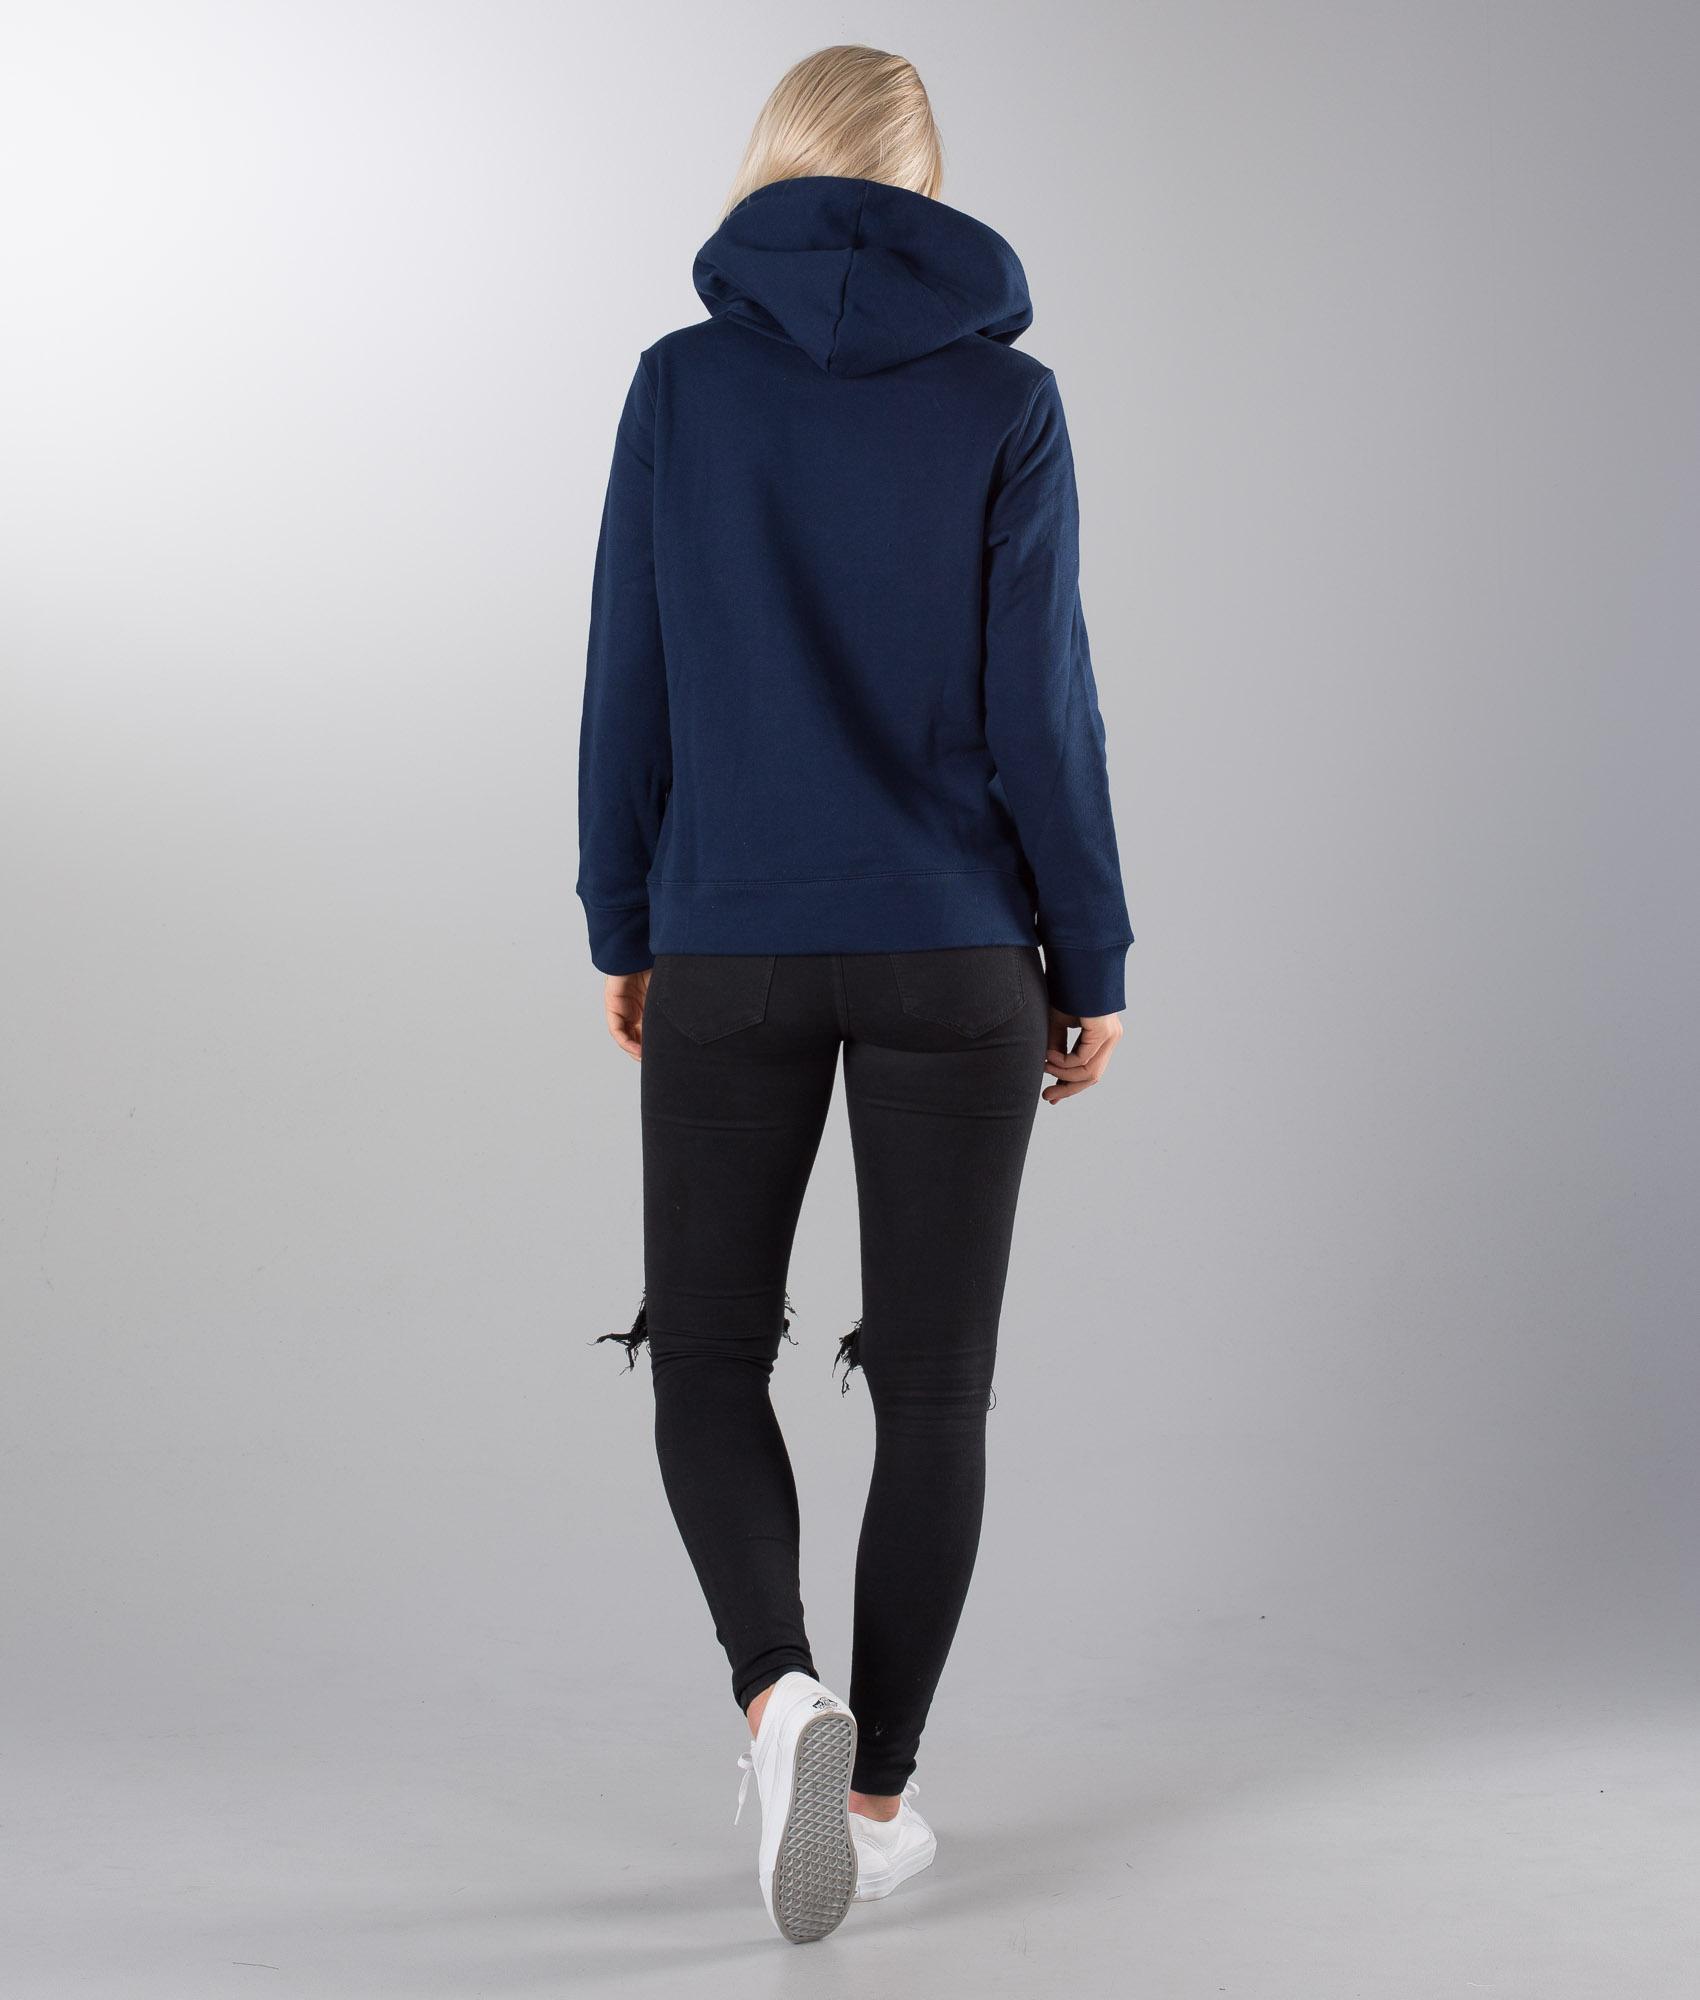 nl Ridestore Originals Collegiate Hoodie Trefoil Adidas Navy zRqXYqv 7f2af594da416